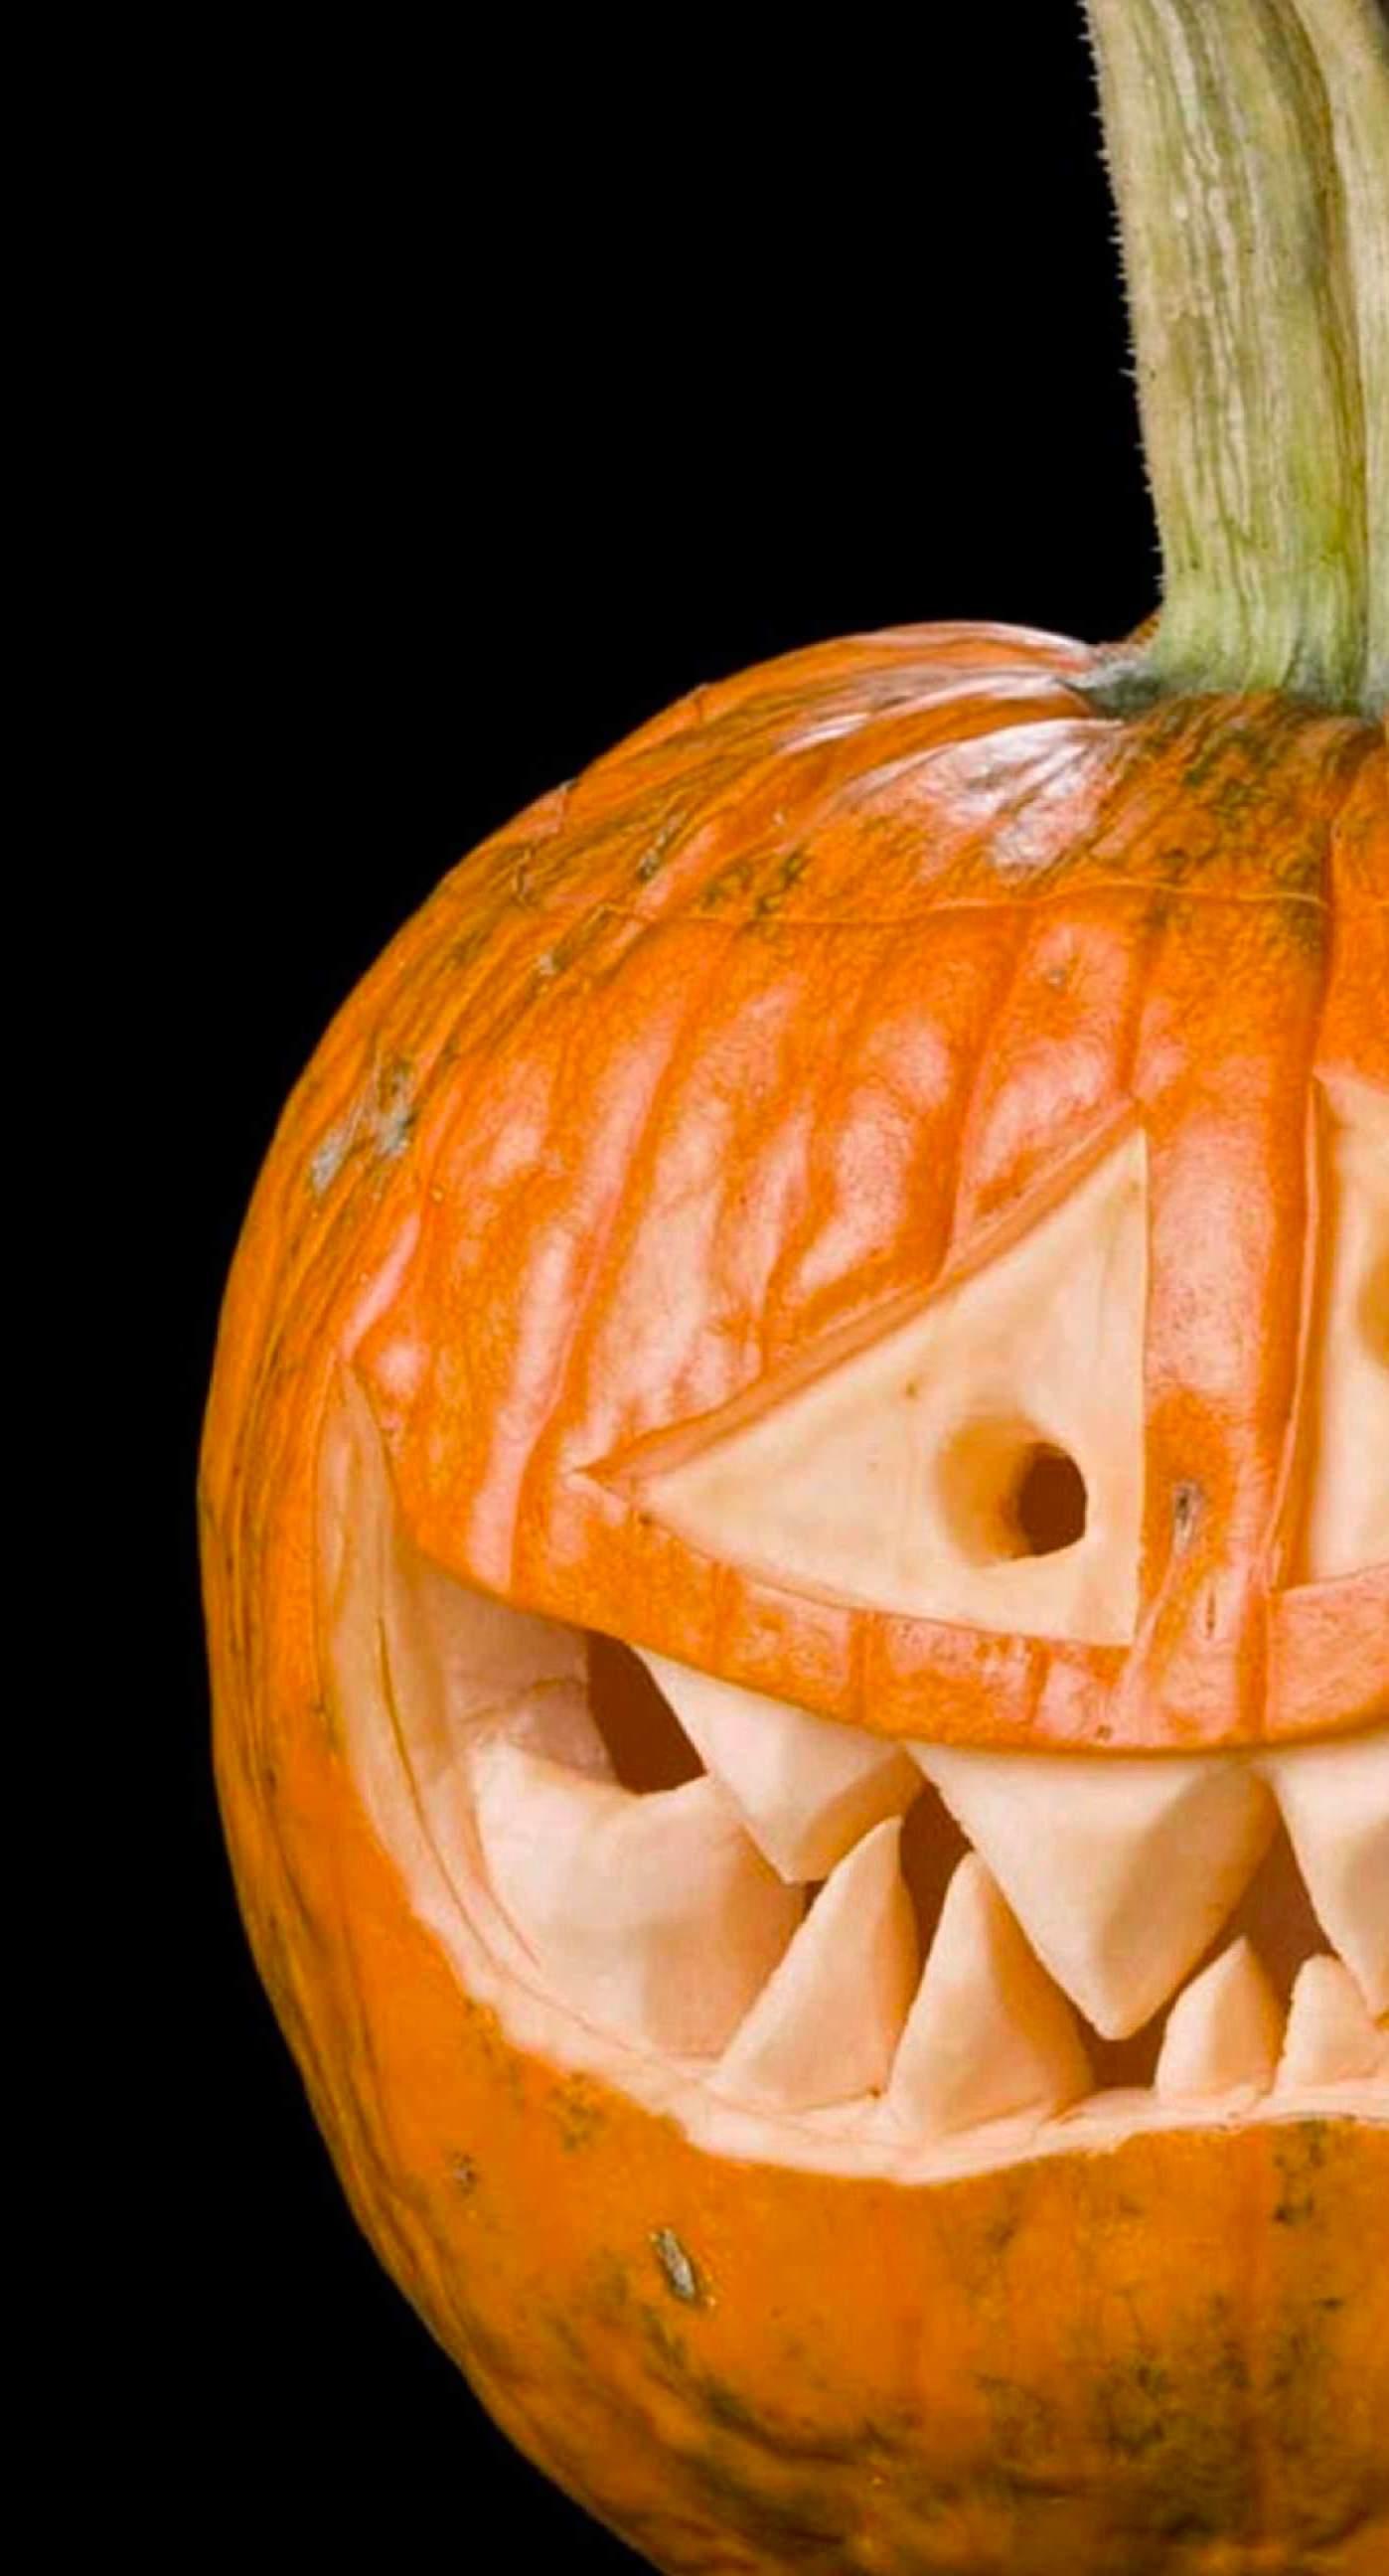 Halloween Pumpkin Head Wallpaper Sc Iphone8plus